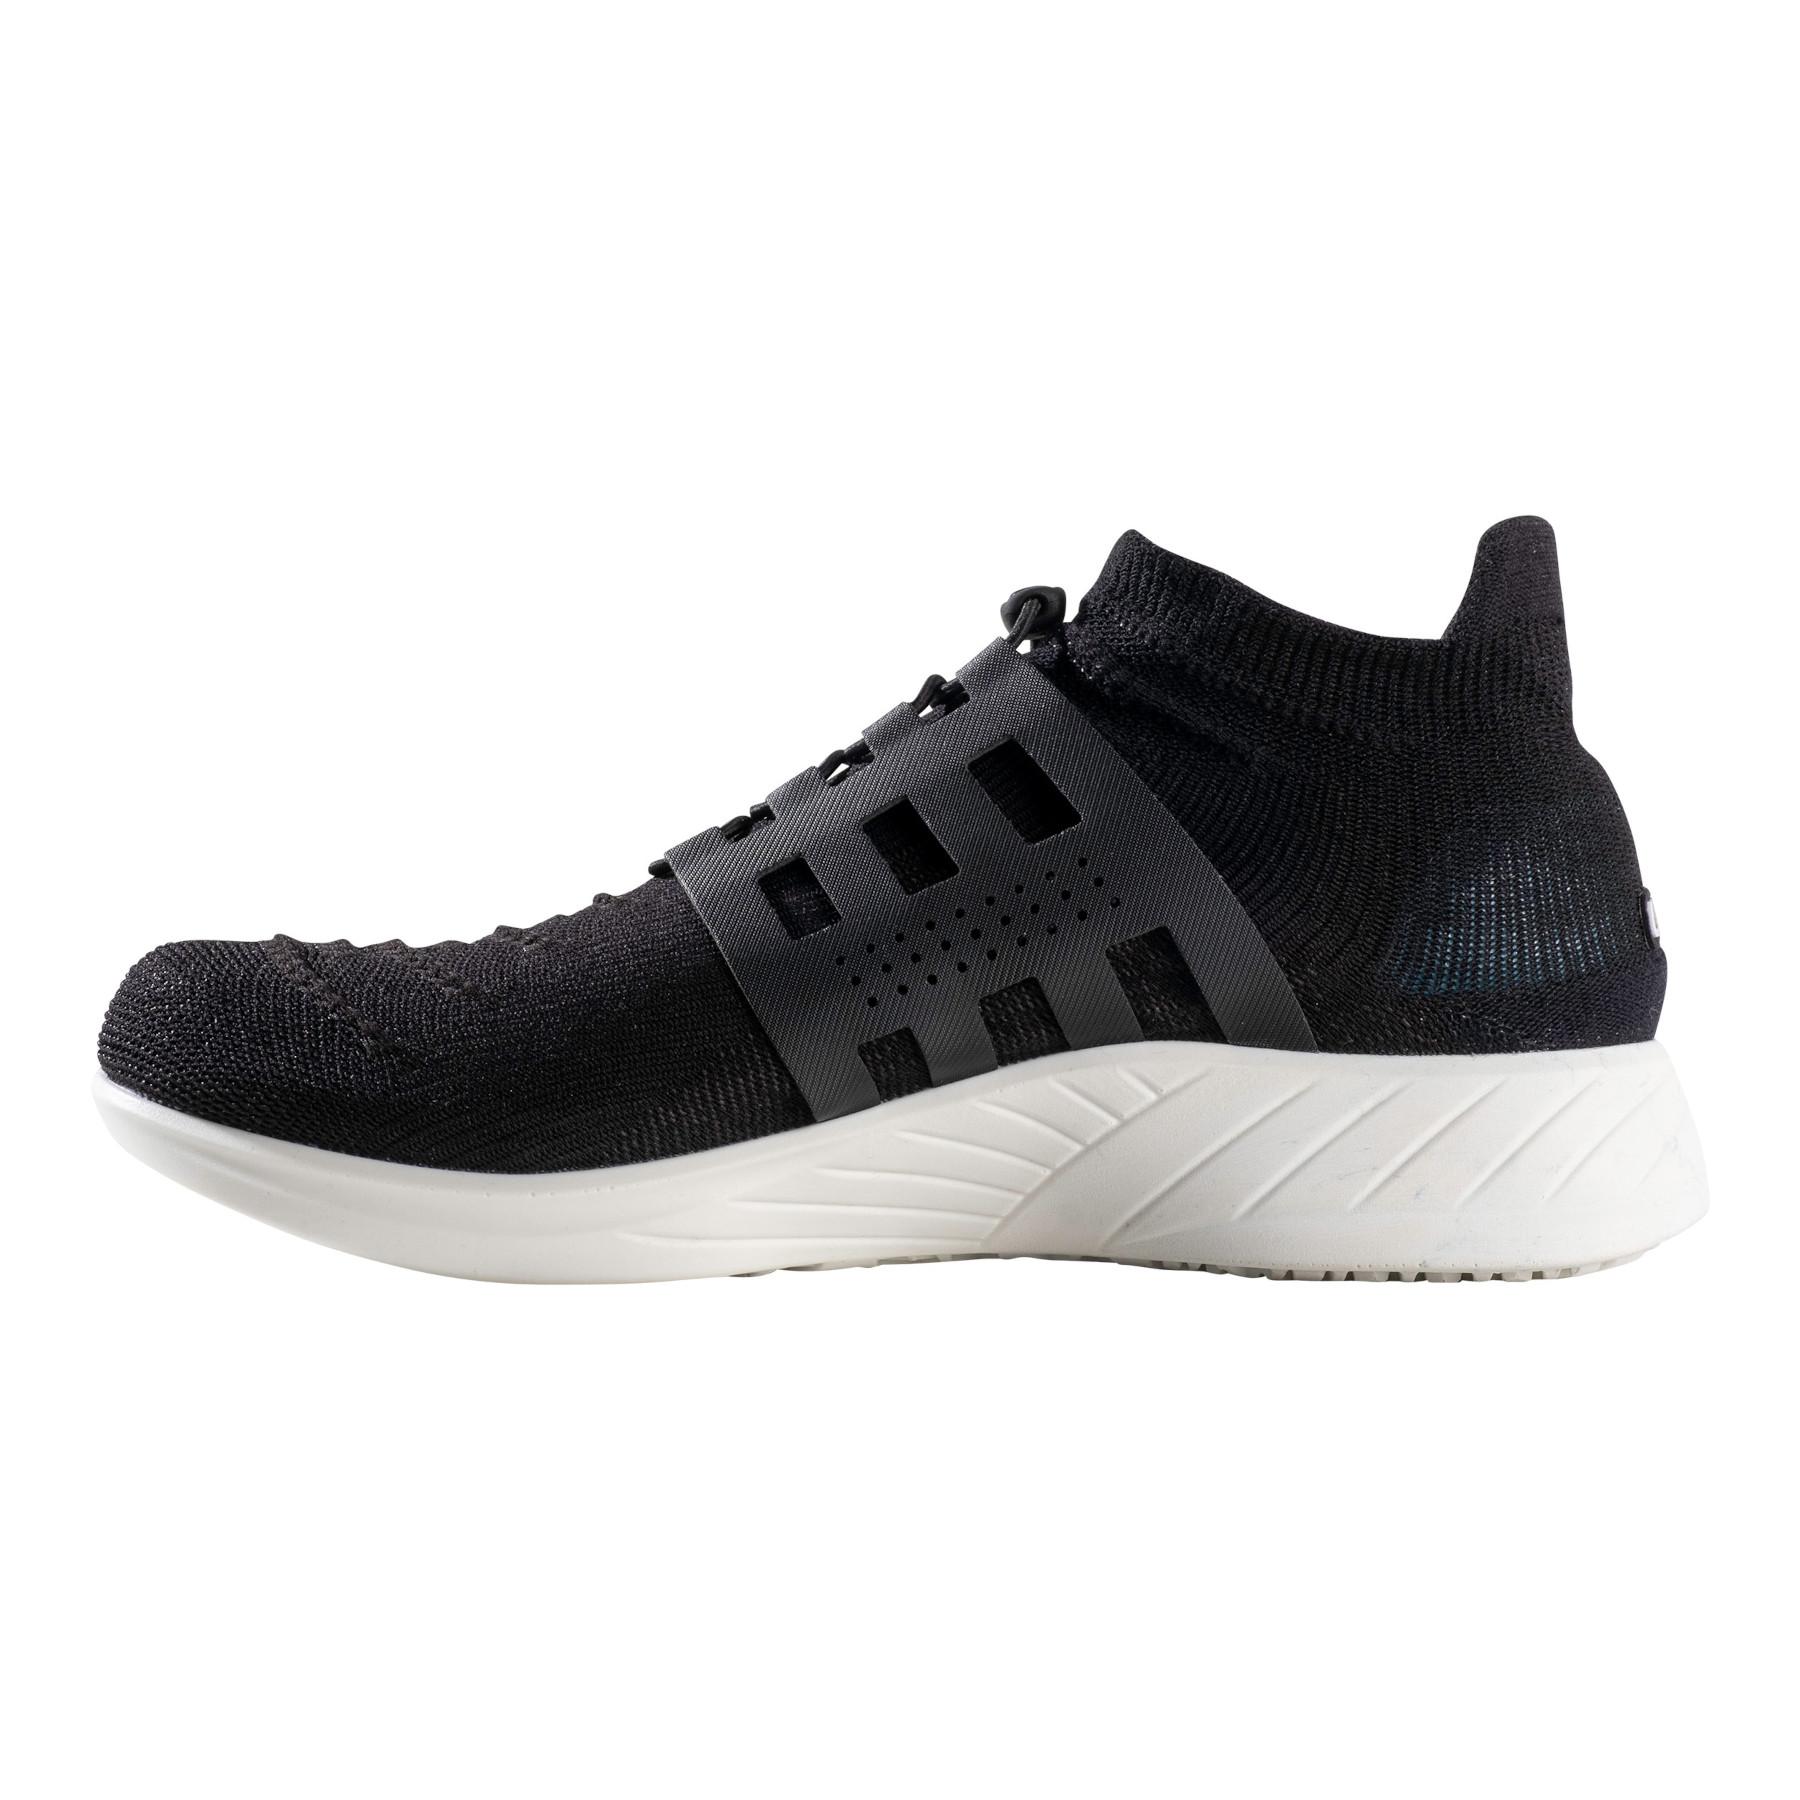 Image of UYN X-Cross Tune Man Running Shoes - Optical Black/Black